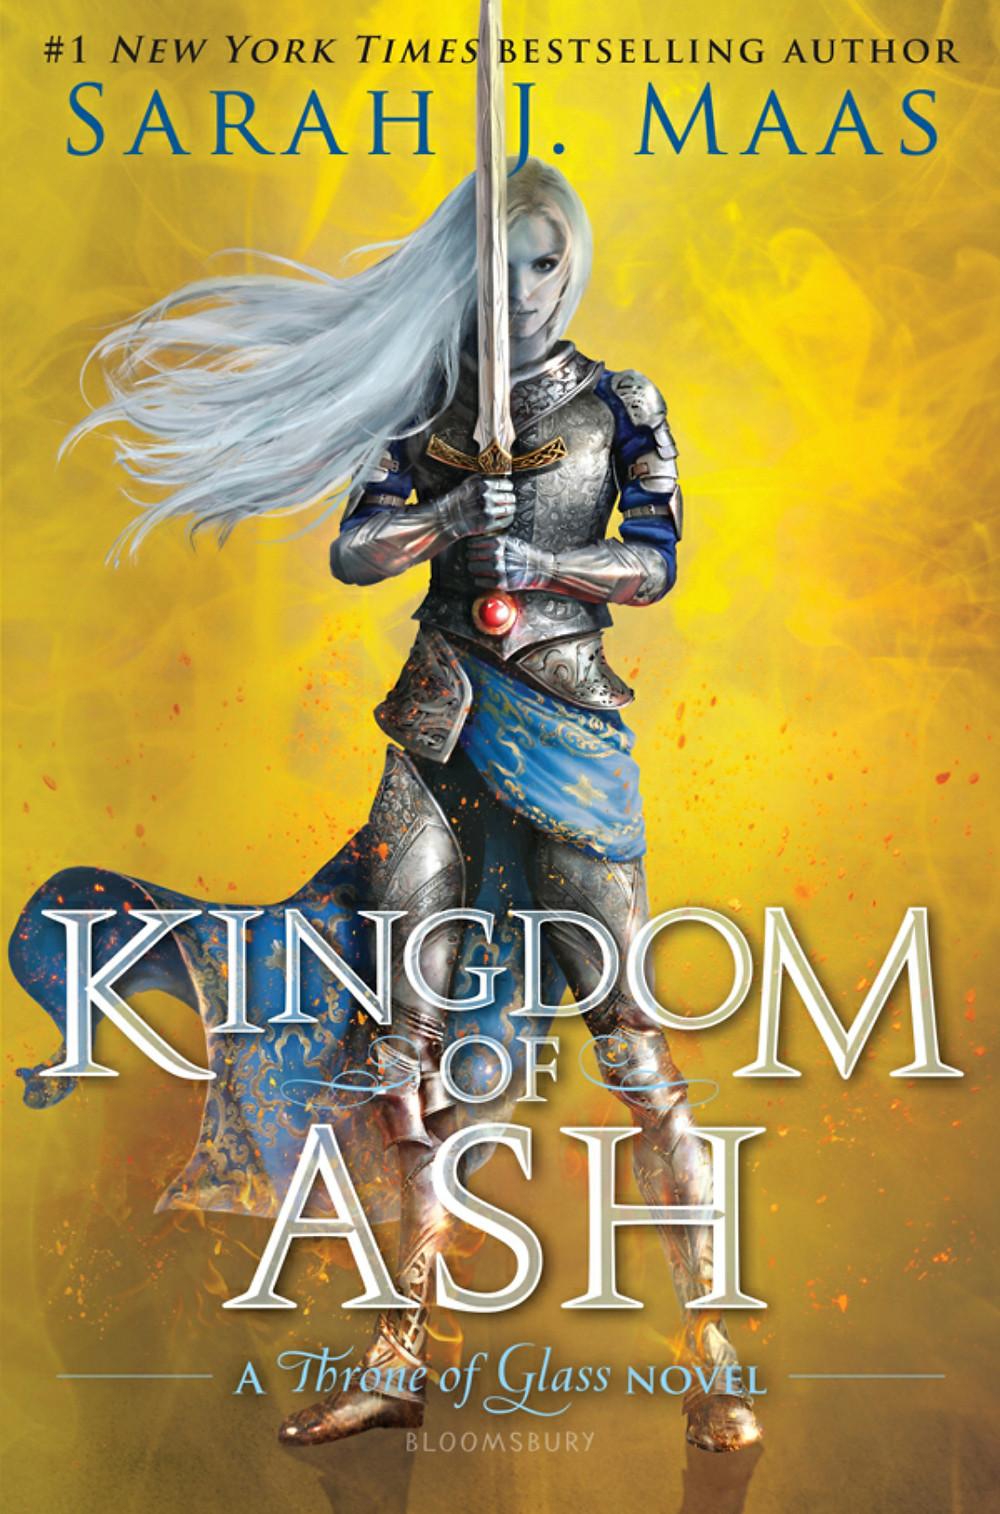 Kingdom of Ash, Sarah J. Maas, novel, book, read, throne of glass series